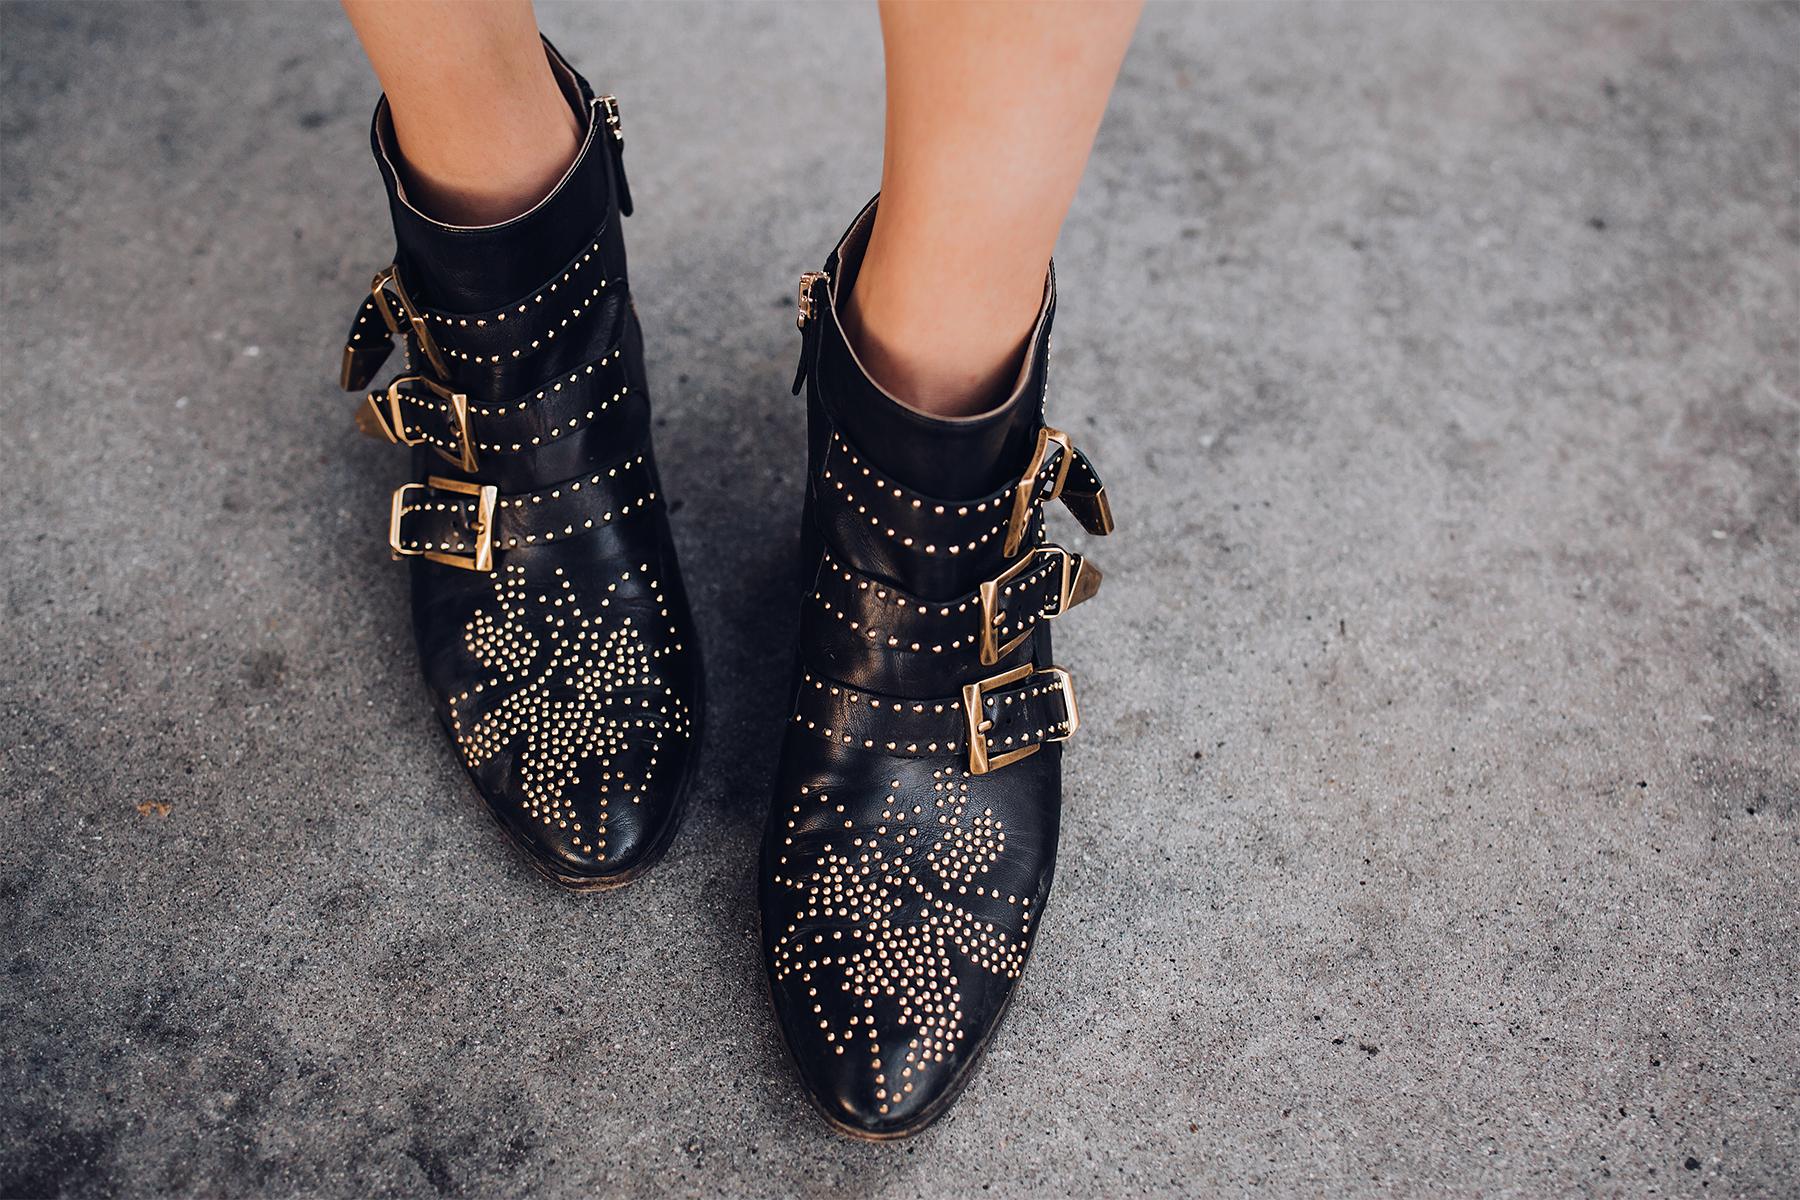 Fashion Jackson Wearing Chloe Susanna Black Booties Fashion Jackson San Diego Fashion Blogger Street Style